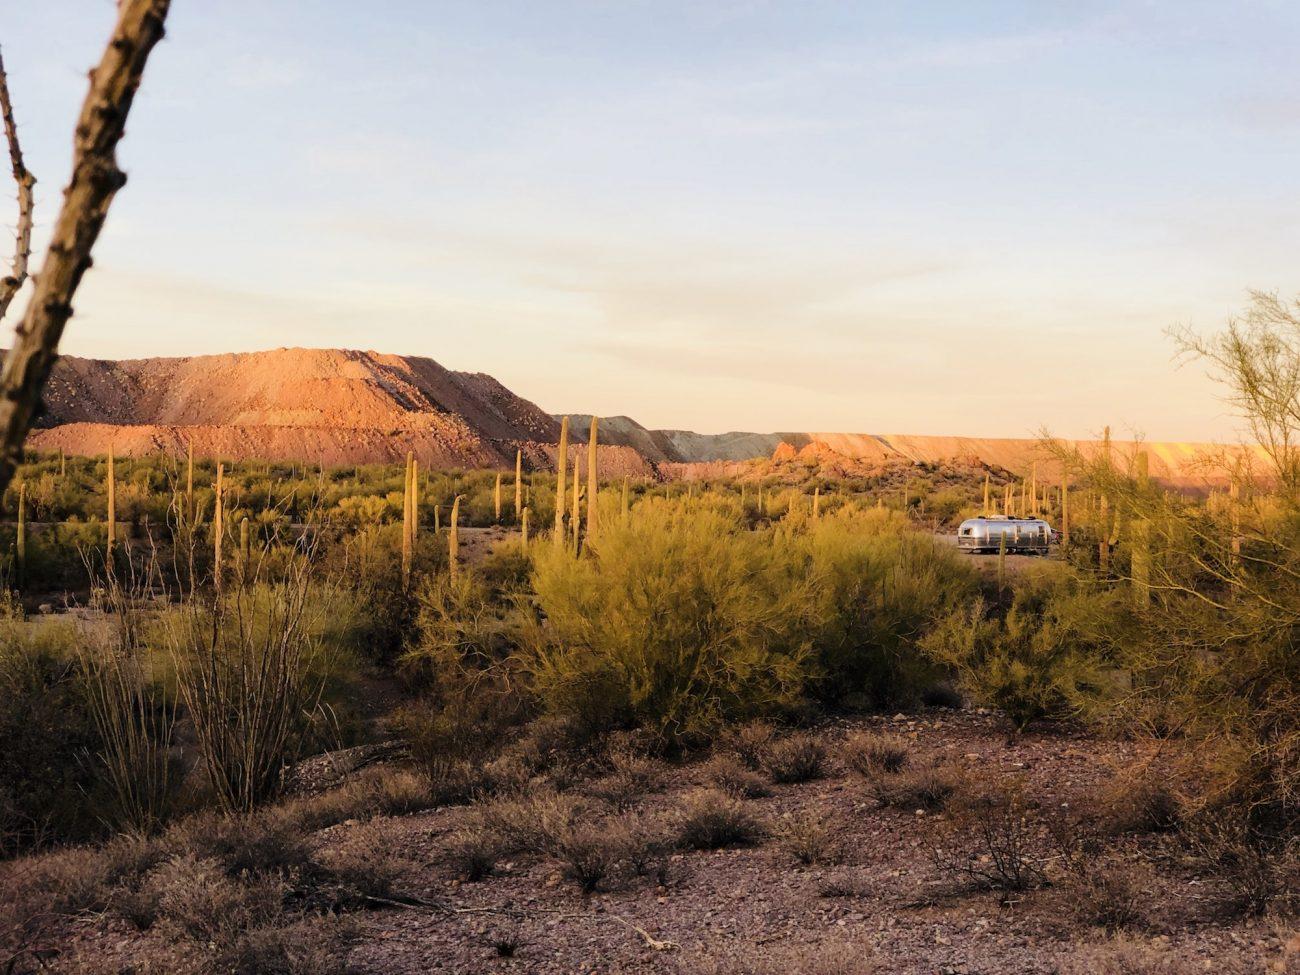 Airstream boondocking among cactus near mine at sunset in Ajo, AZ